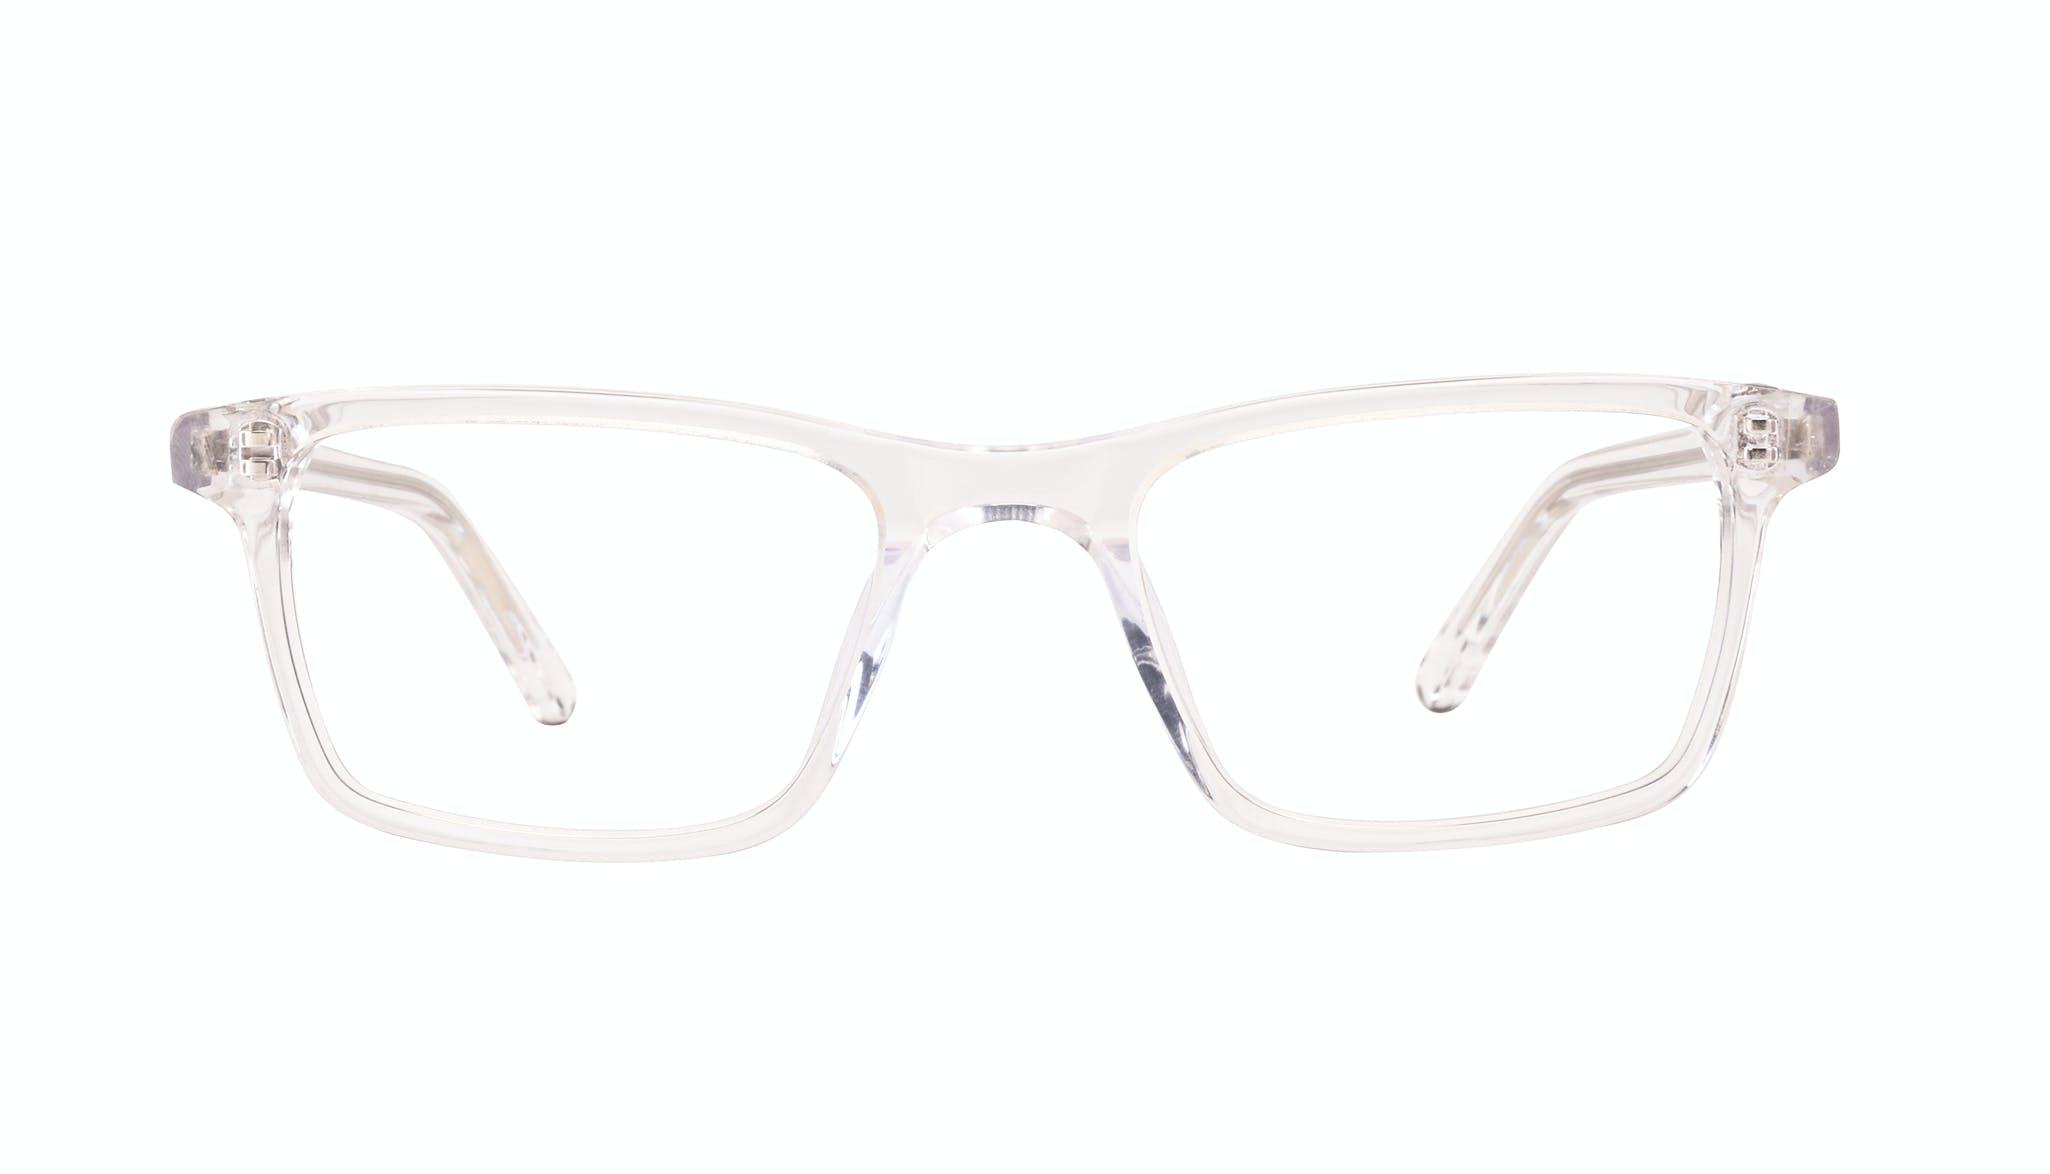 Affordable Fashion Glasses Rectangle Eyeglasses Men Henri SML Clear Front